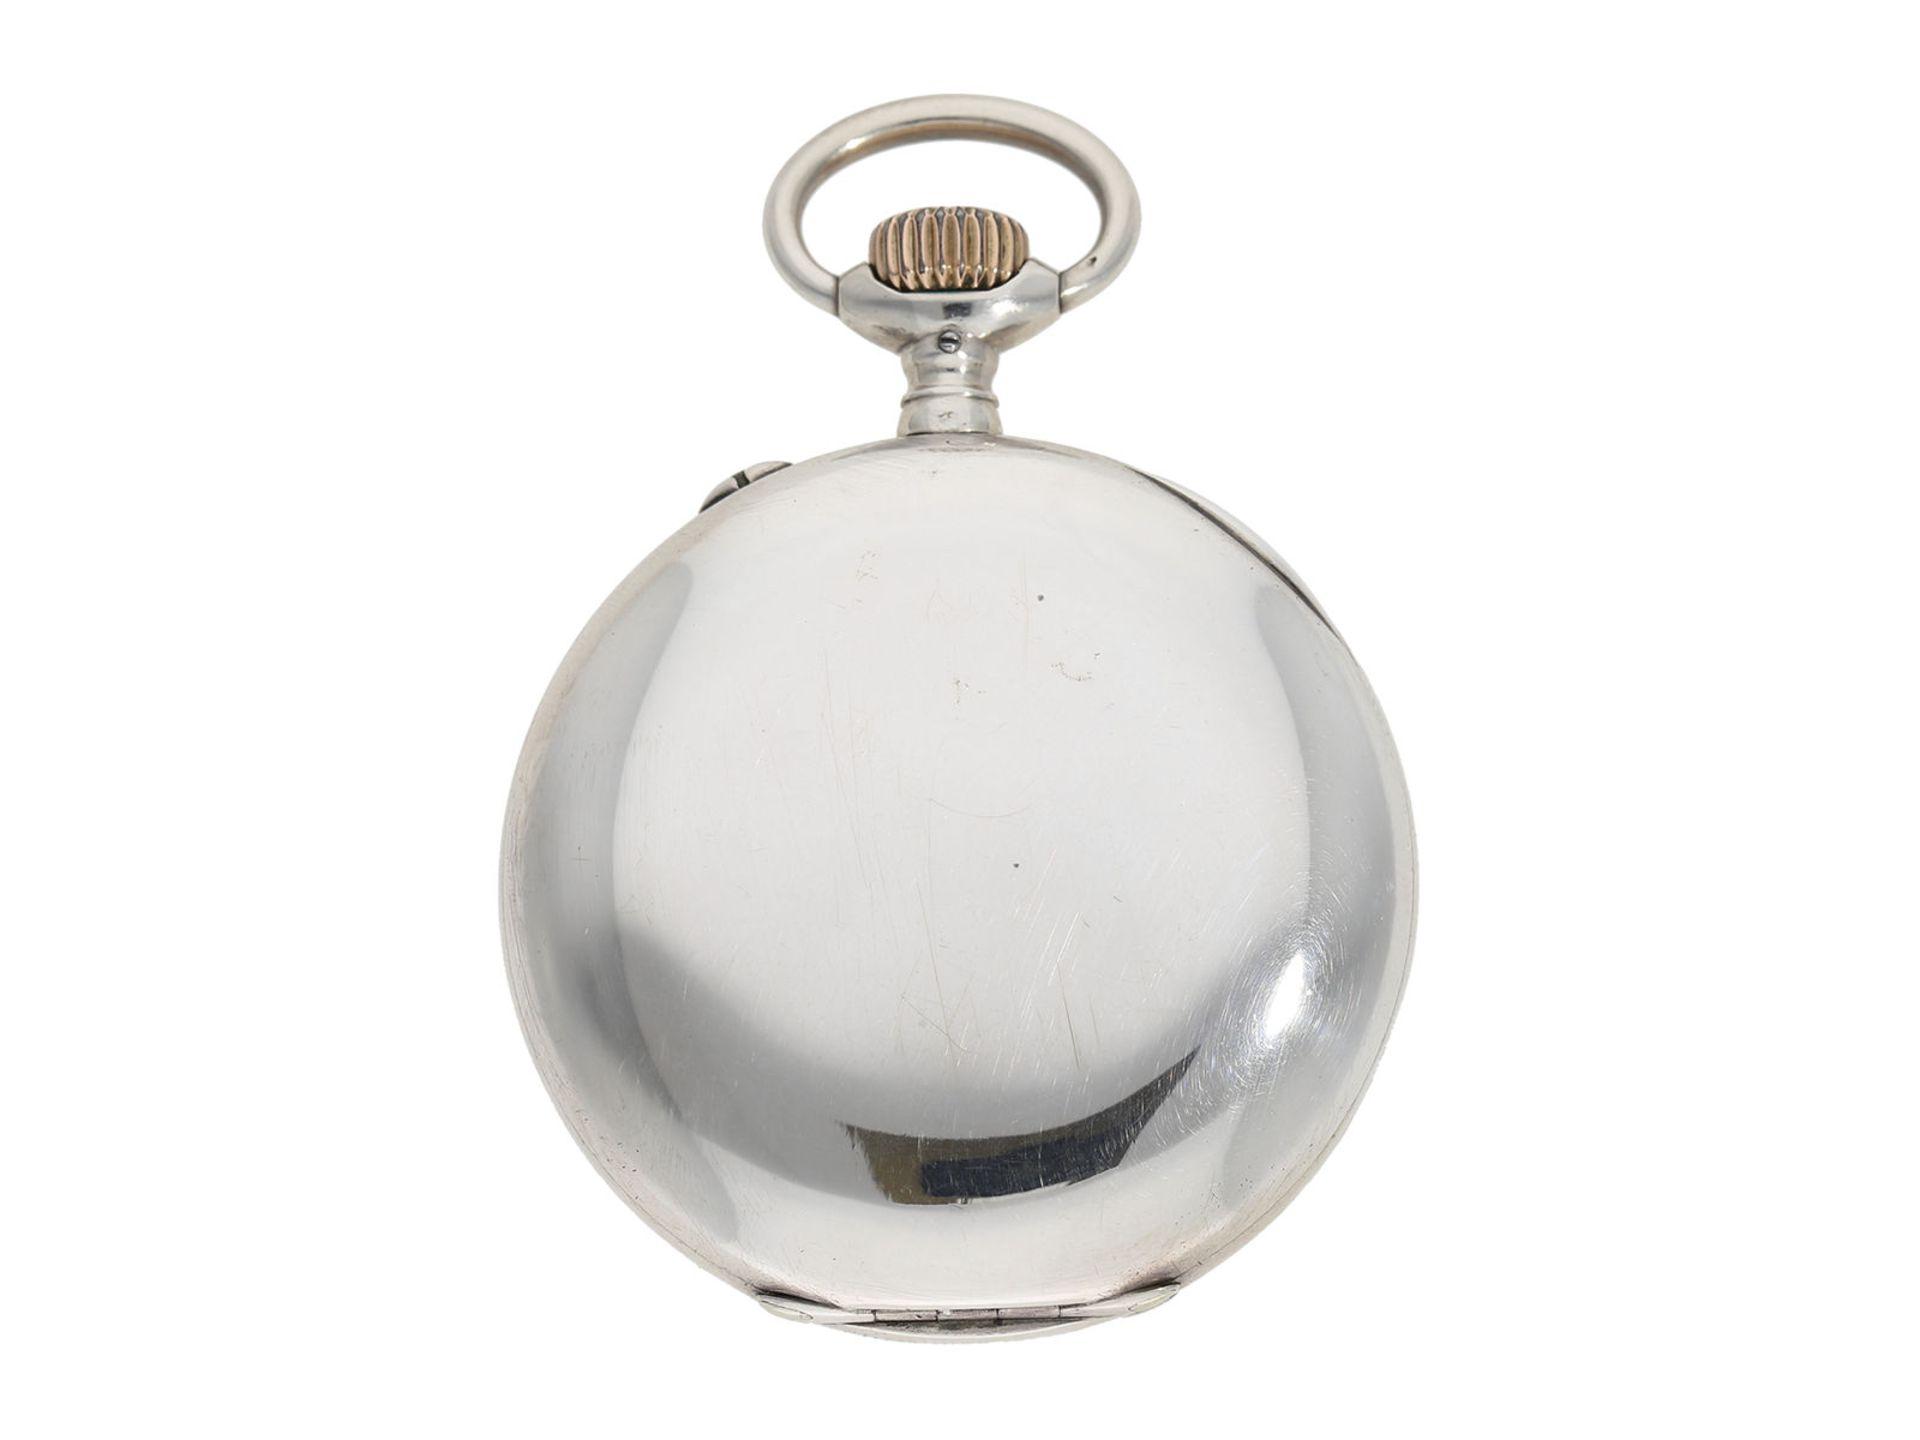 "Pocket watch: early IWC man's pocket watch rare quality ""Extra"", Schaffhausen 1902, delivered to - Bild 6 aus 6"